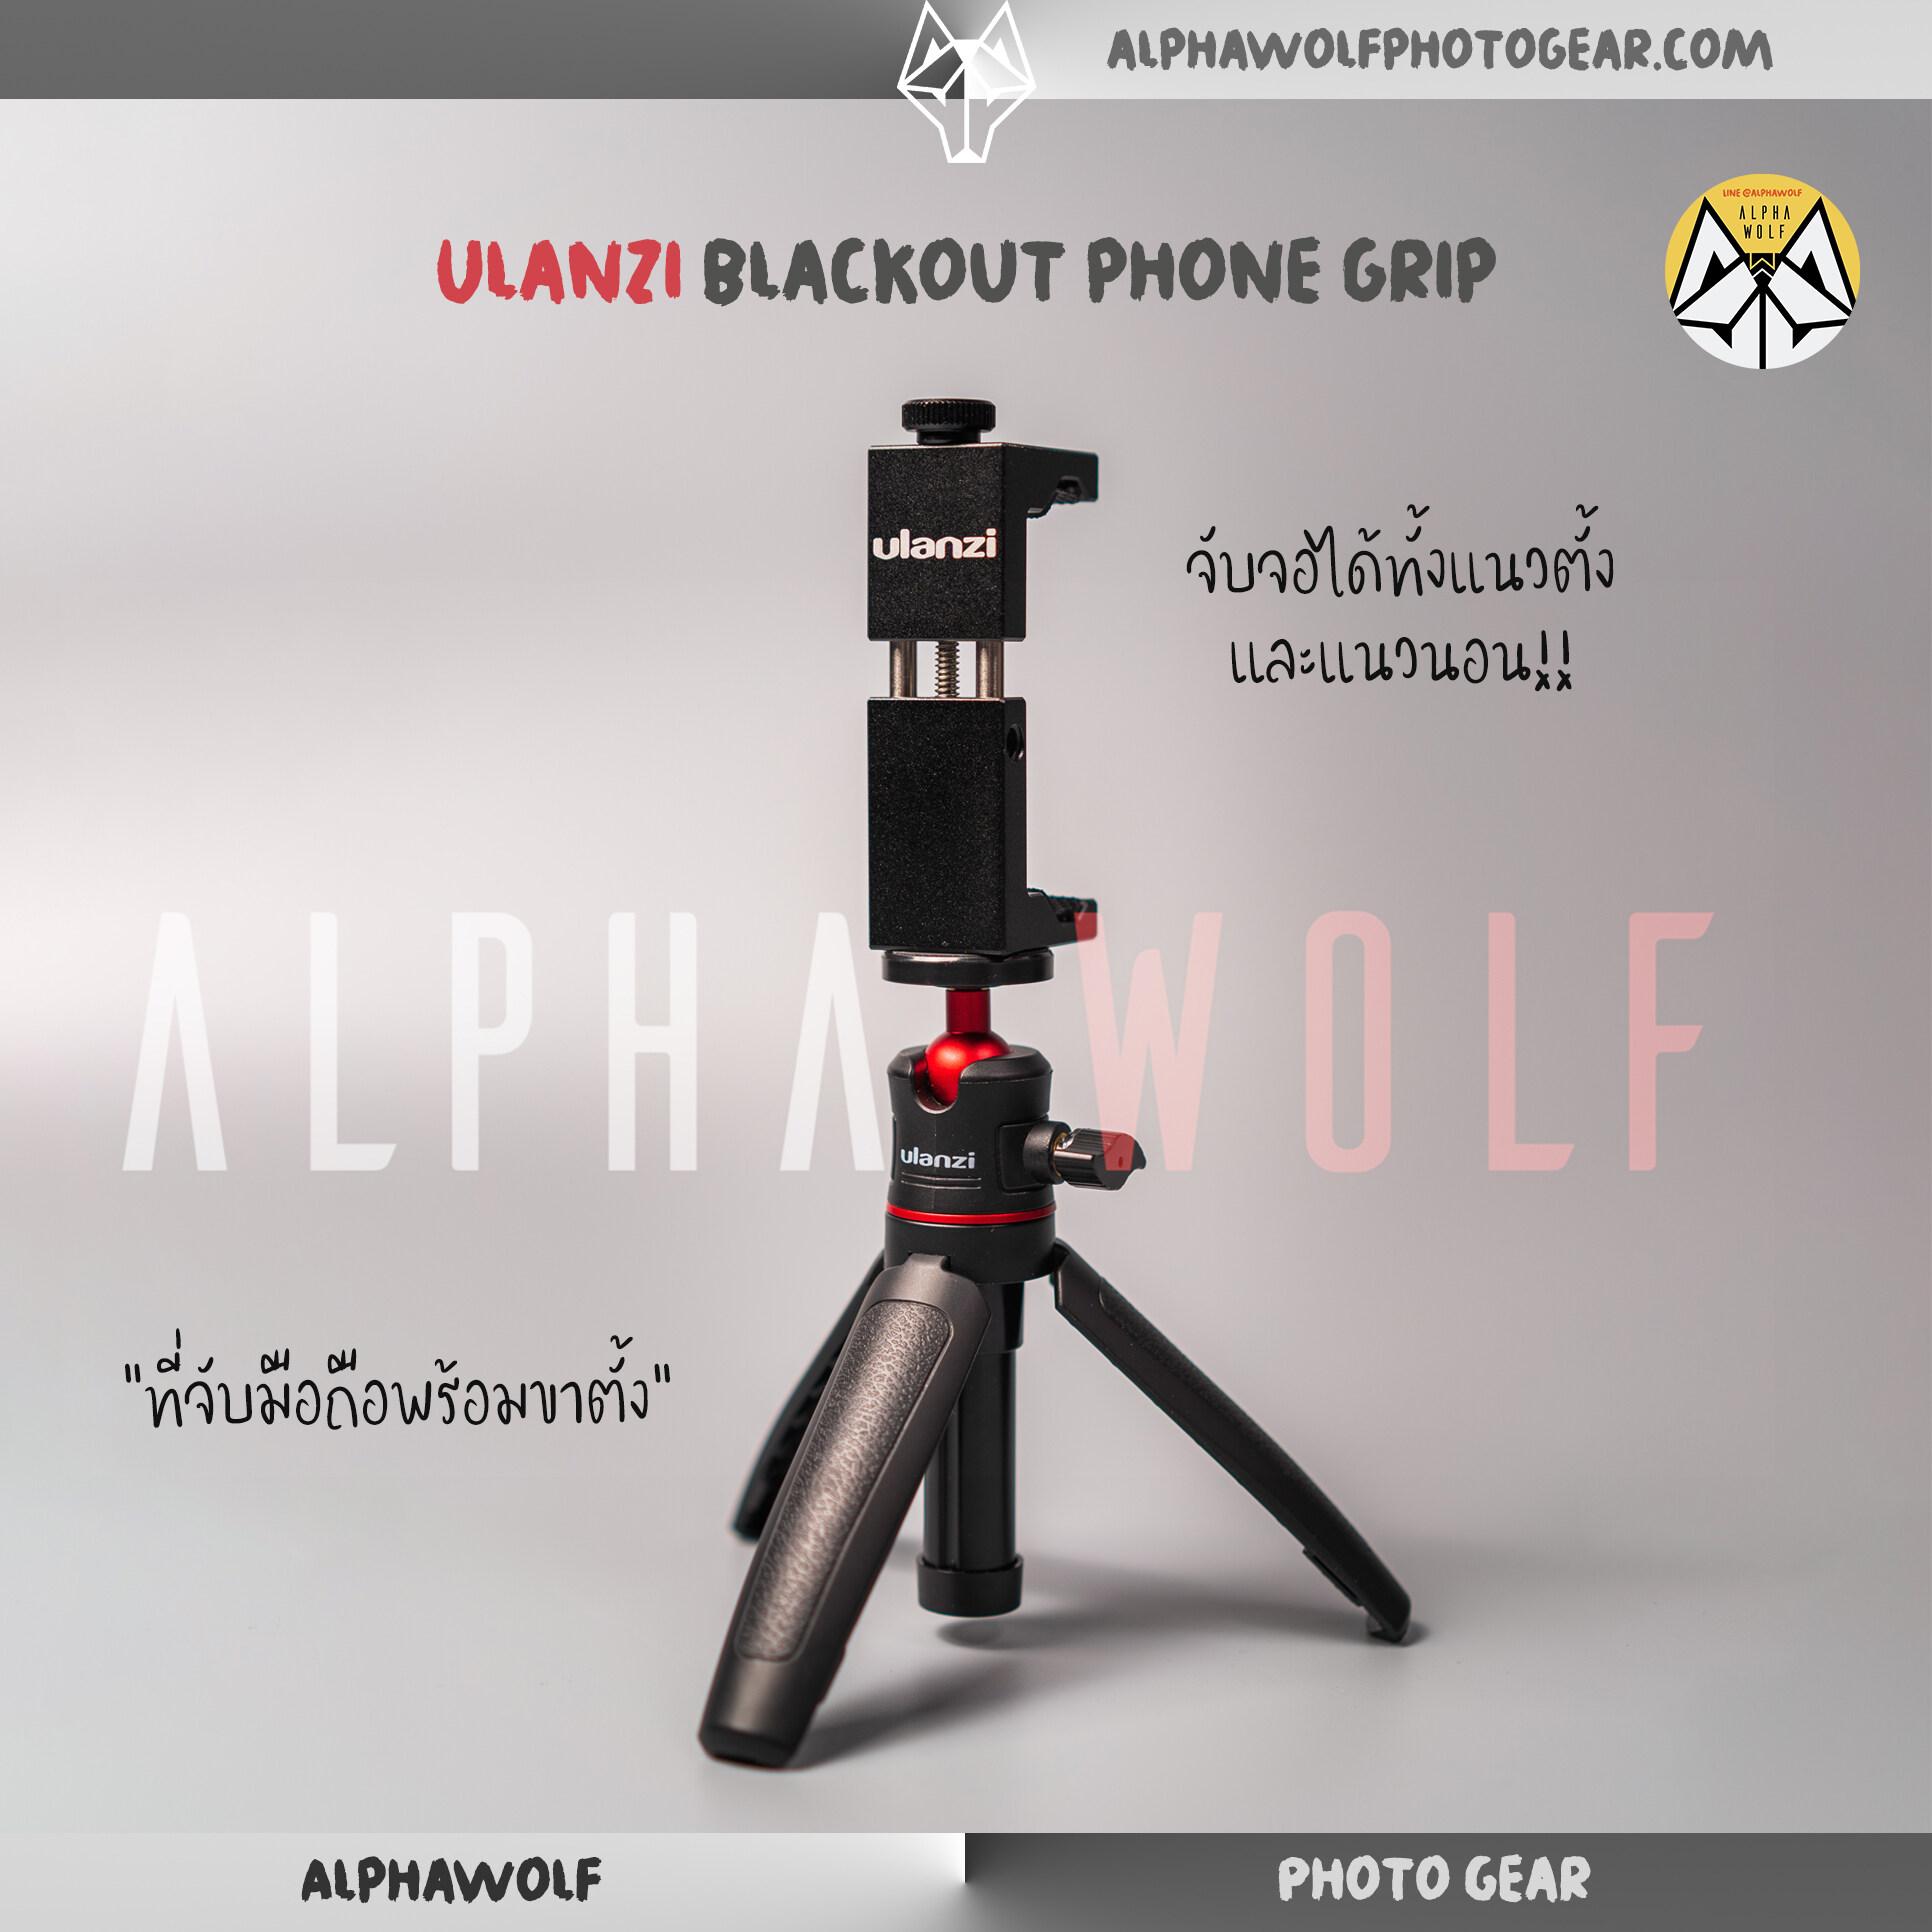 Ulanzi Blackout Phone Grip ที่จับมือถือ ที่จับโทรศัพท์ อลูมิเนียมสีดำแดง พร้อมขาตั้งยืดหดสูง 25cm ยึดได้ทั้งแนวตั้ง แนวนอน Tiktok Fb Live Phone Holder /alphawolf.